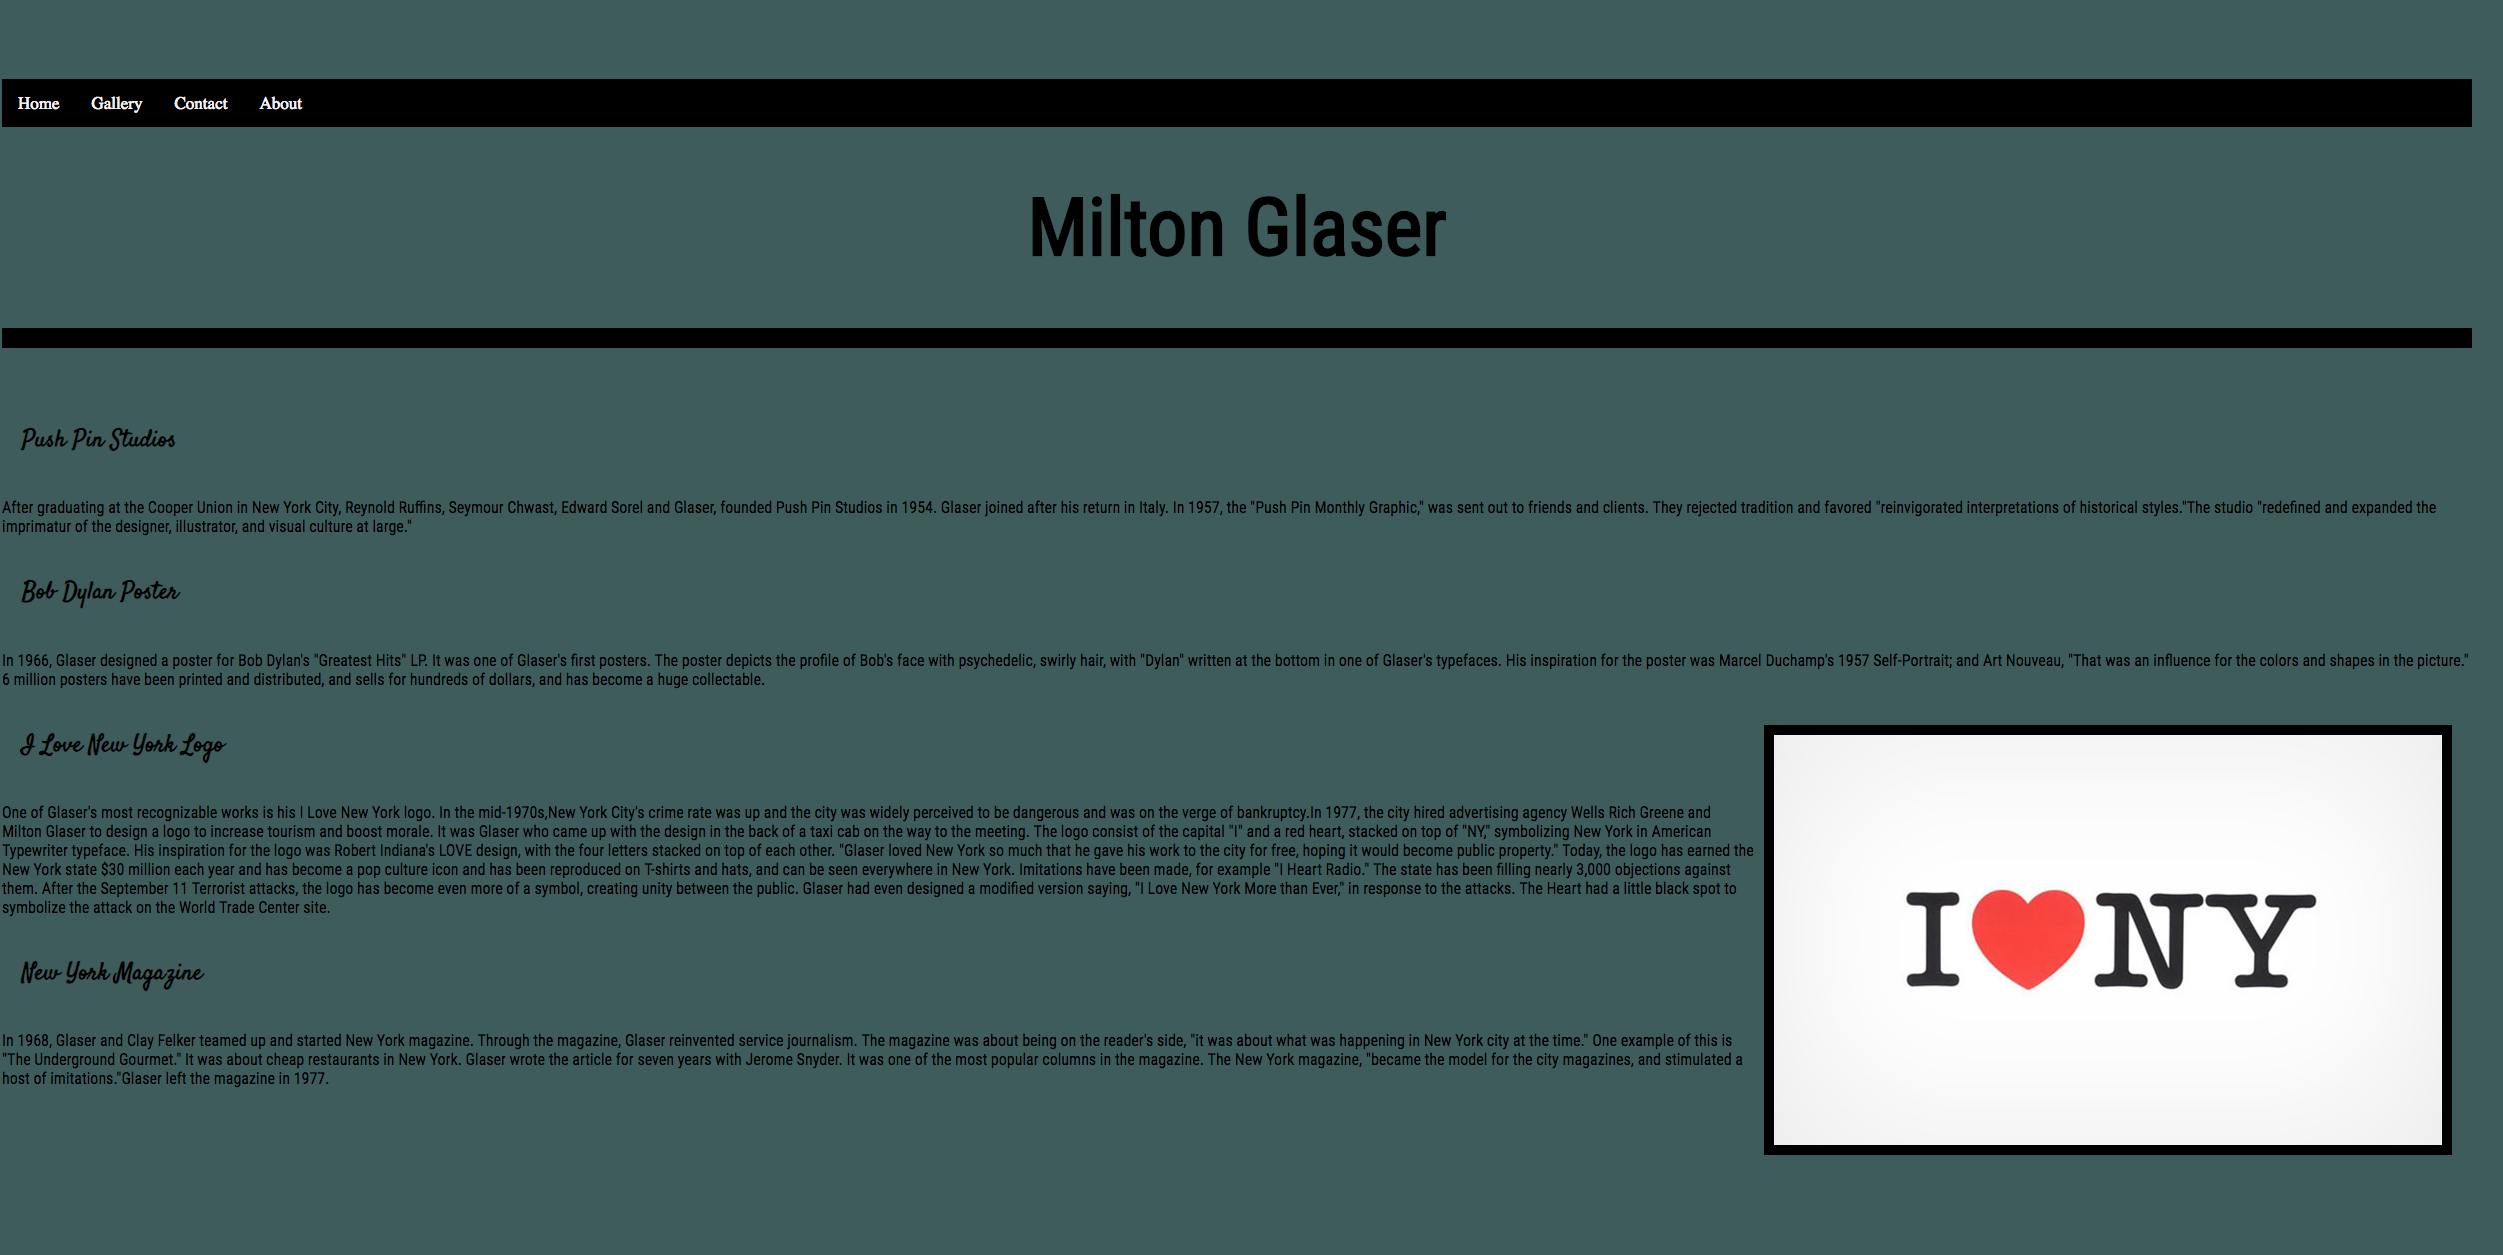 Pin by Anlevis on Website 2019 Milton glaser, I ny, Milton